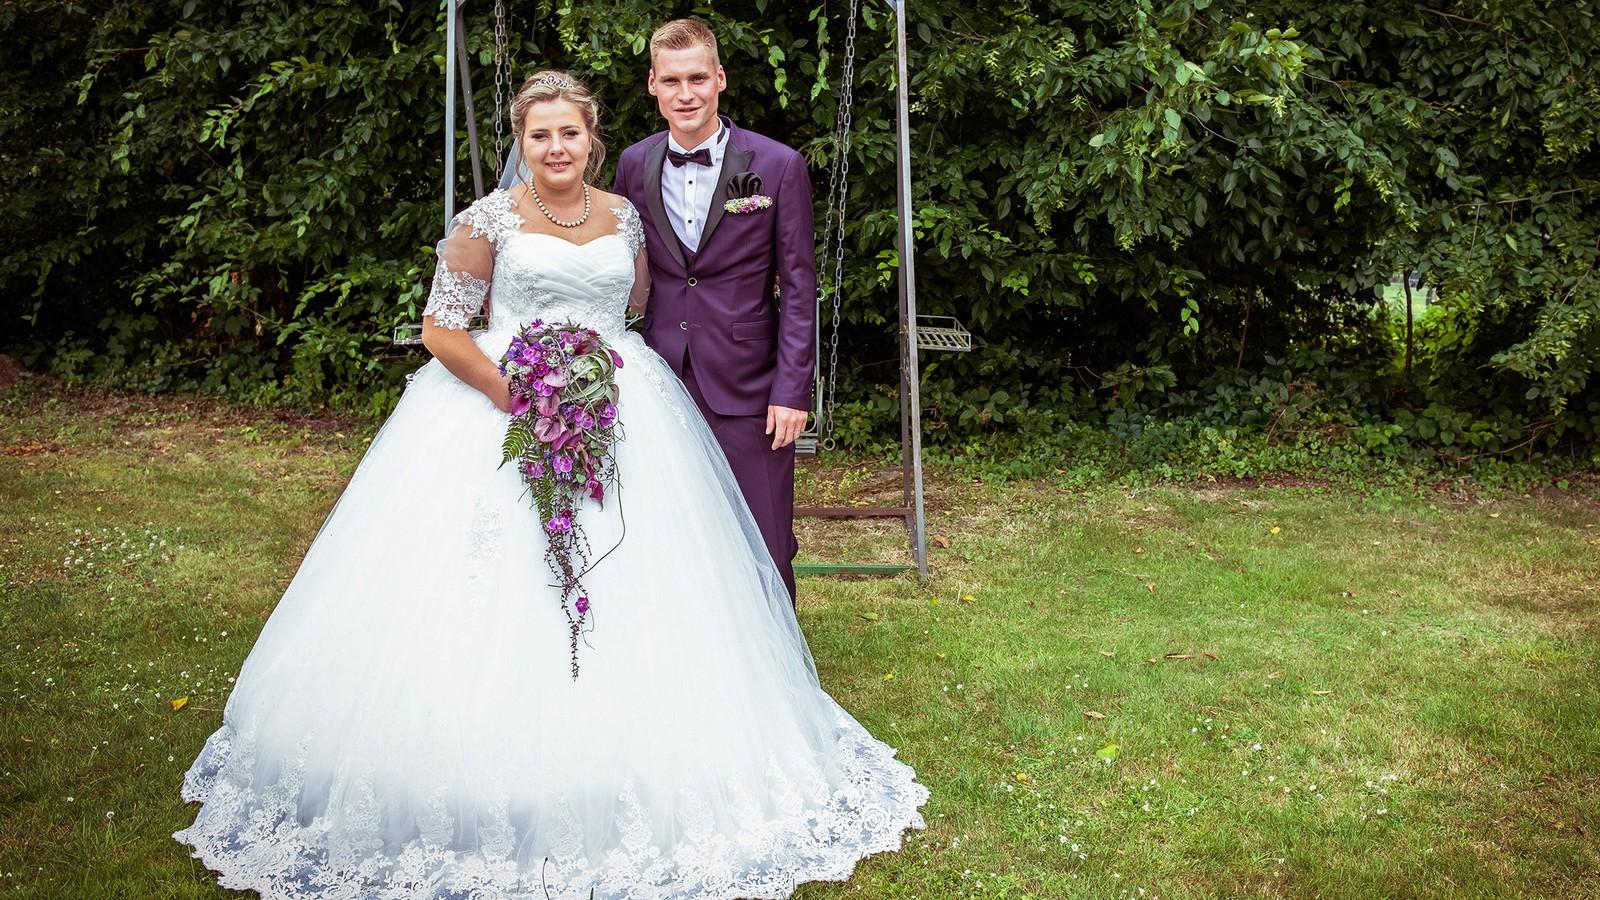 Sarafina Wollny und Peter Heck